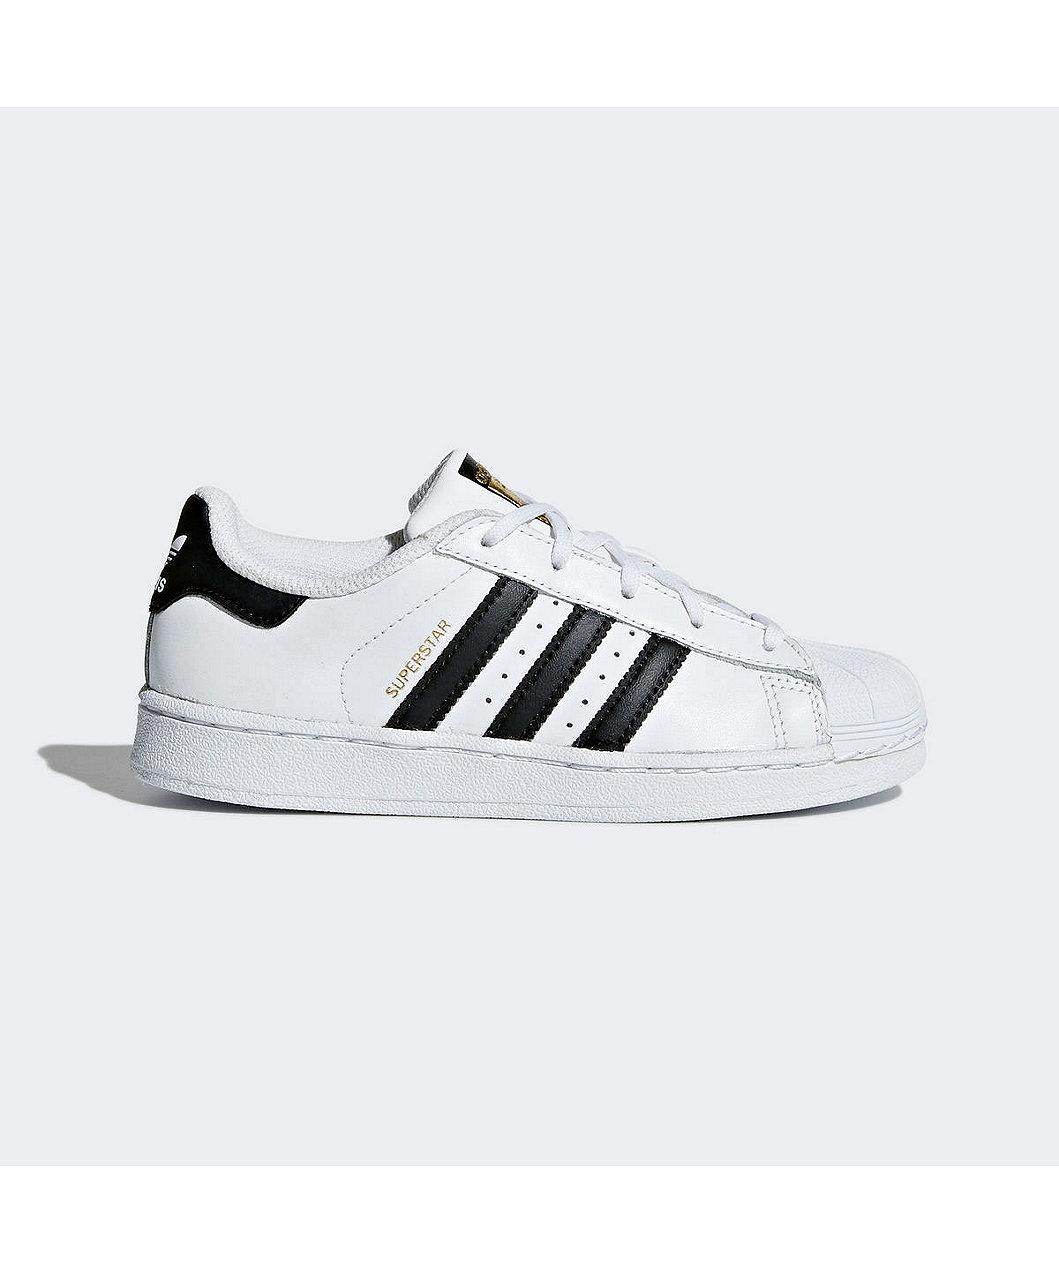 separation shoes 7faca 6d27c adidas Superstar Foundation Kids Shoes - Black White